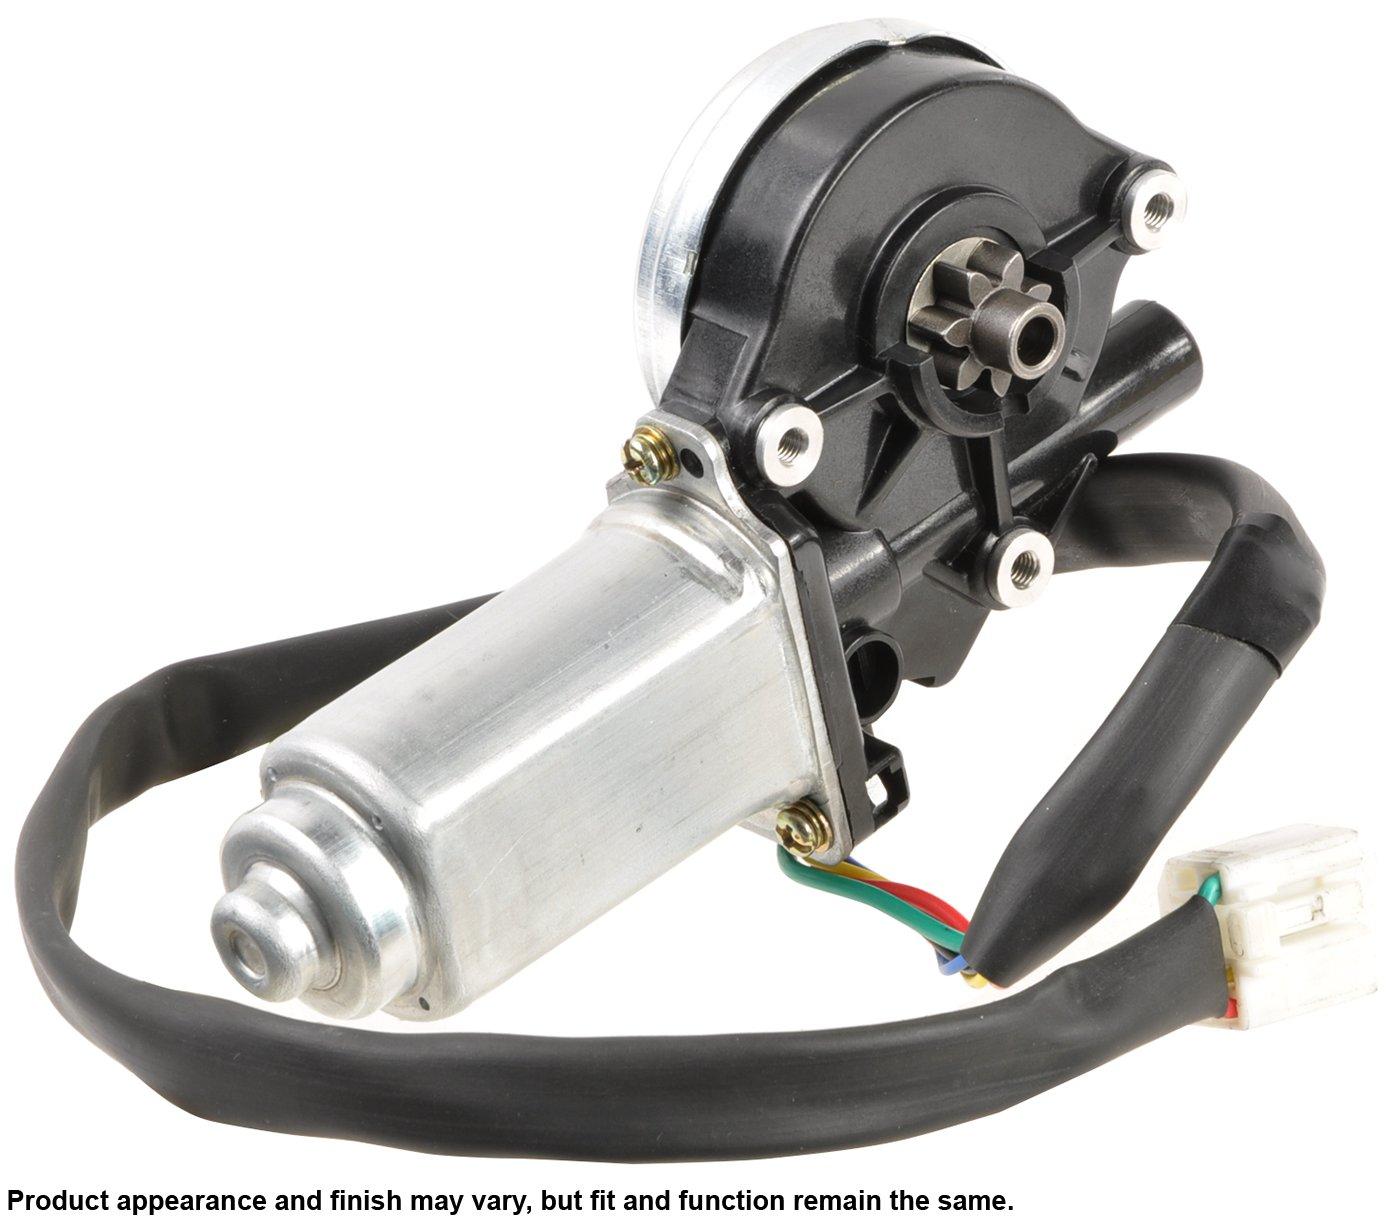 American Shifter 177761 Orange Retro Metal Flake Shift Knob with M16 x 1.5 Insert Black I 3 Chevy